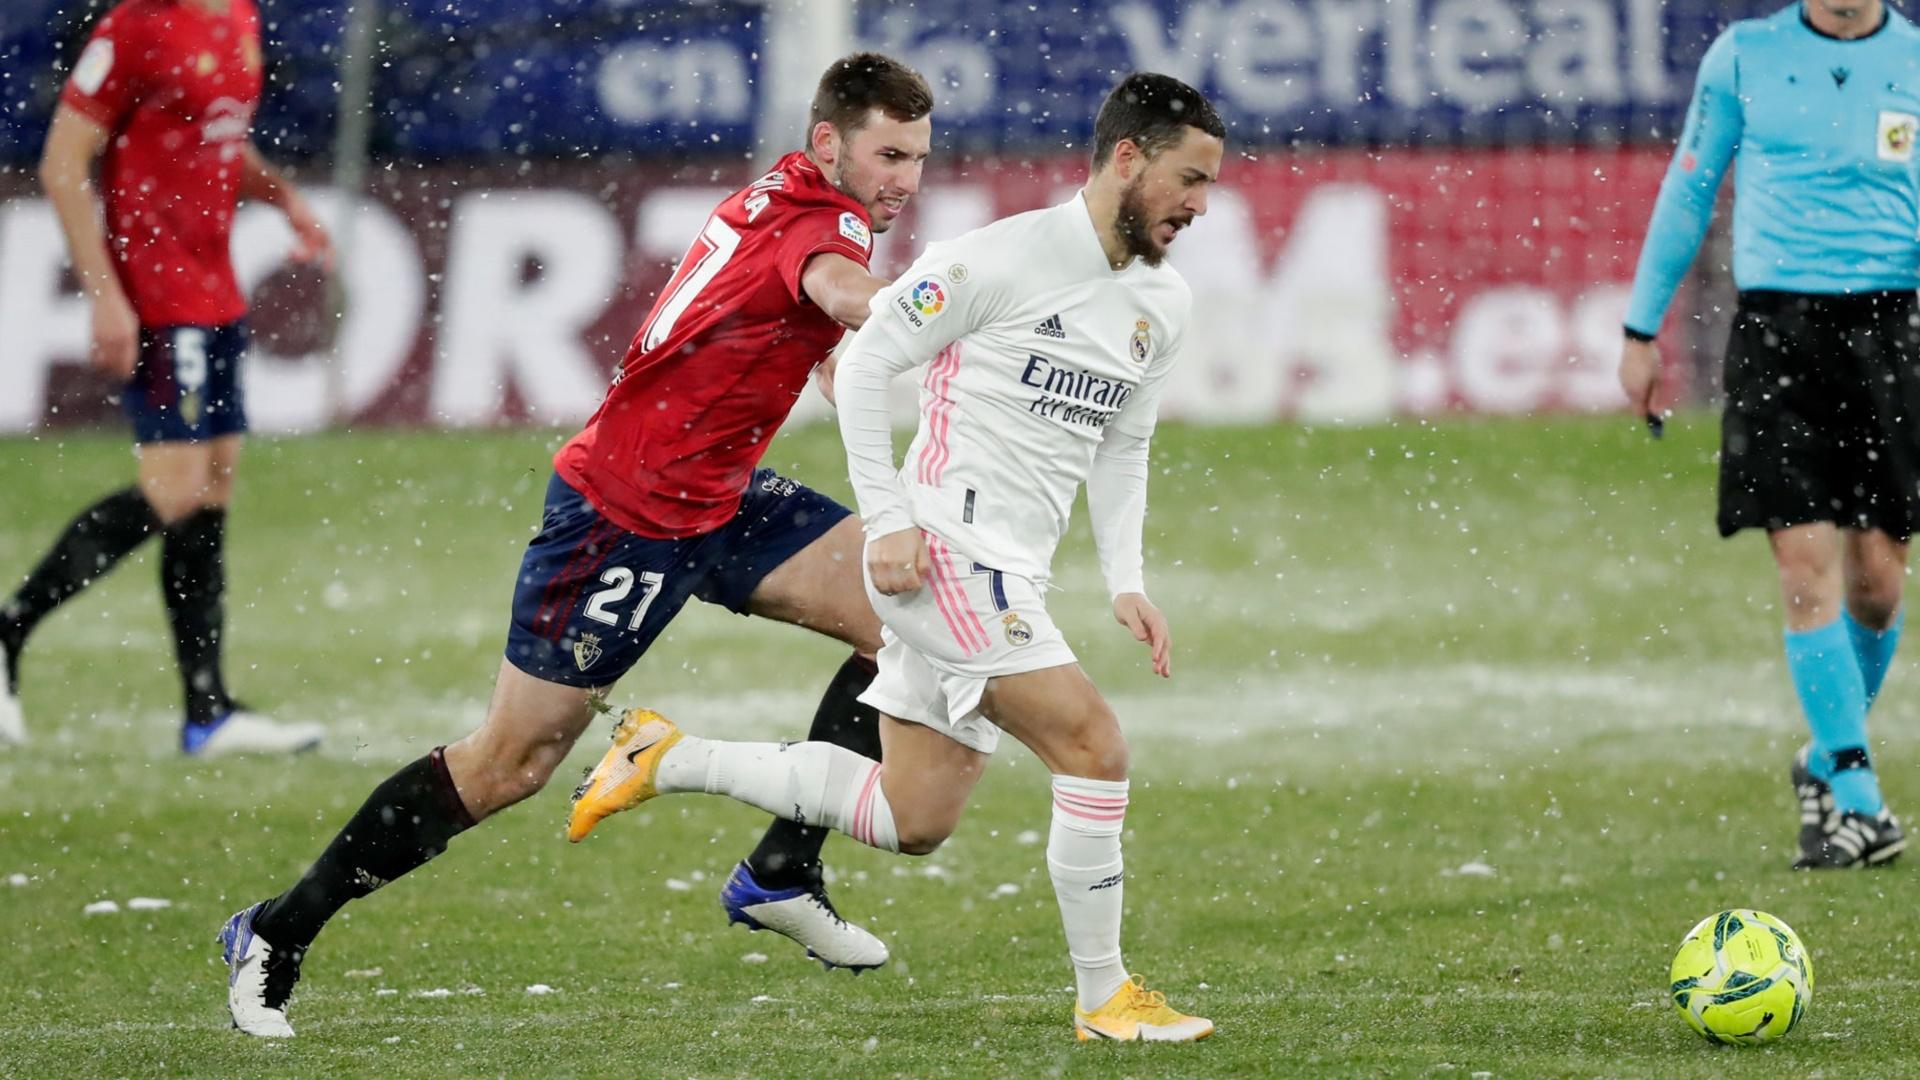 Match Report: Osasuna 0-0 Real Madrid